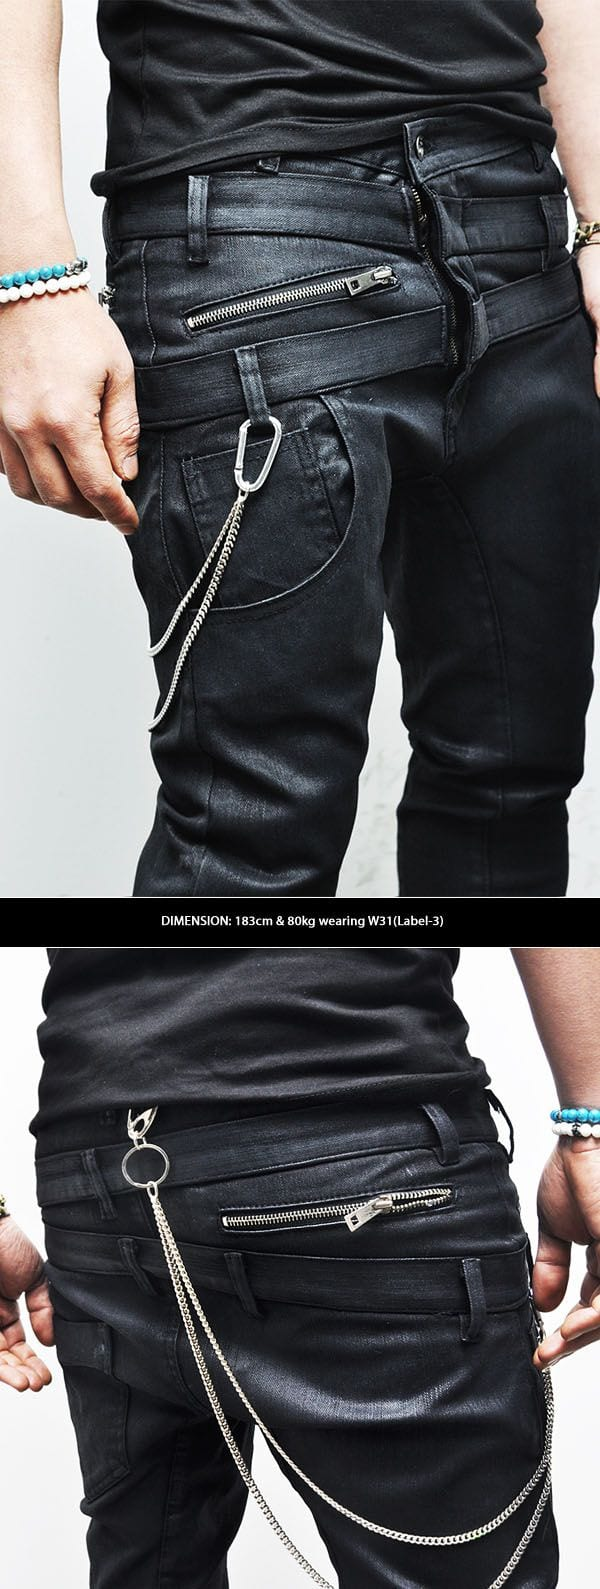 Mens Fashion For Skinny Guys